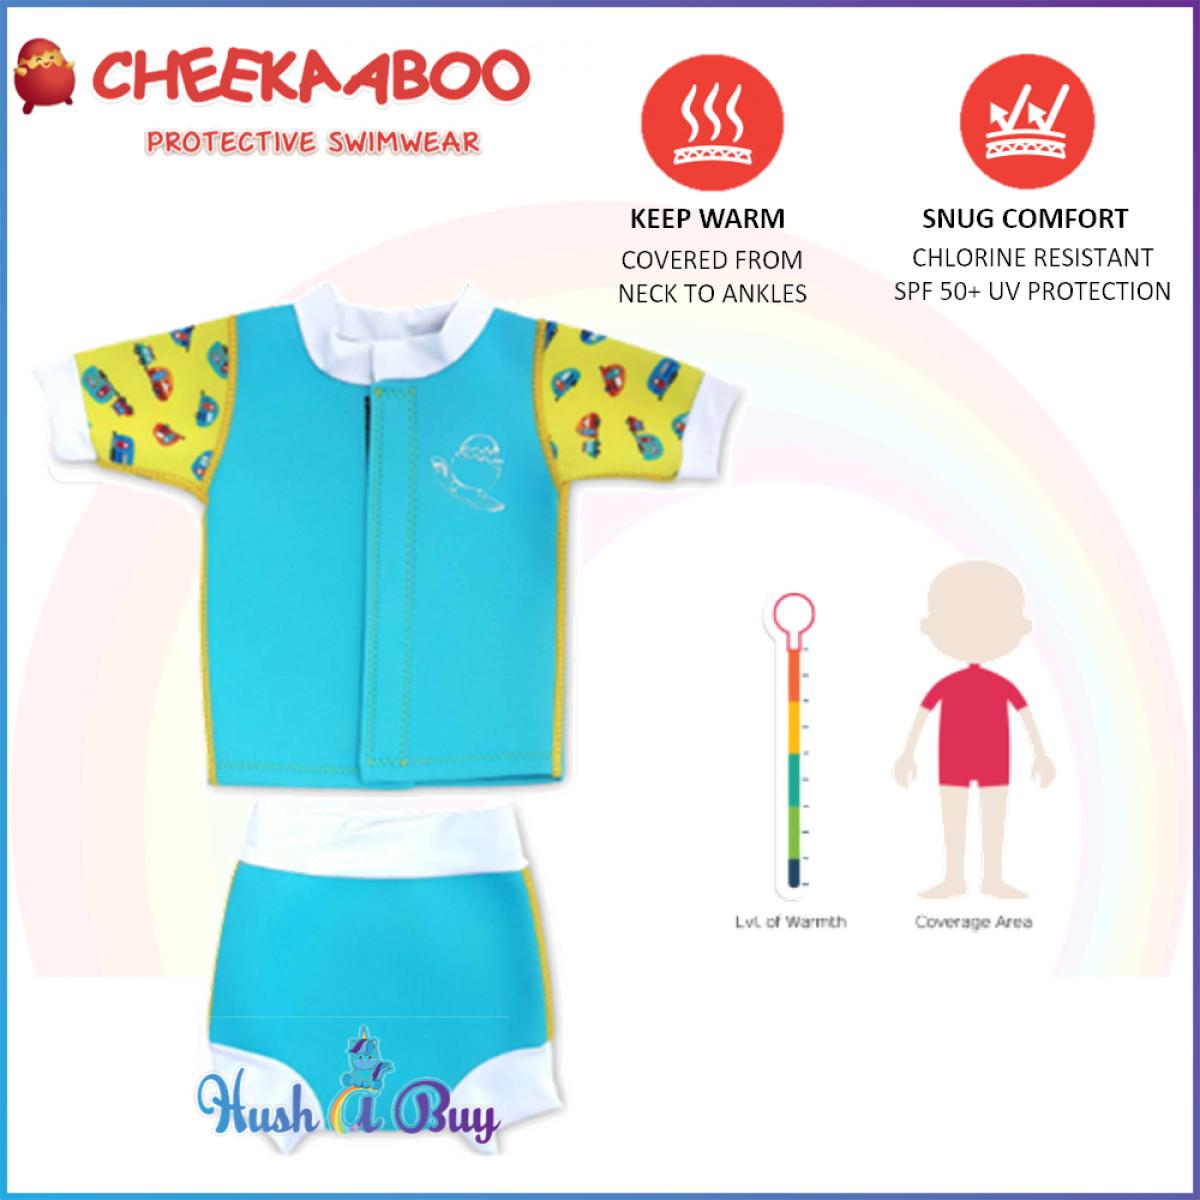 Cheekaaboo Huggiebabes Suit /Warmer/Swim Wear / 2 piece - Light Blue (Camper Van)